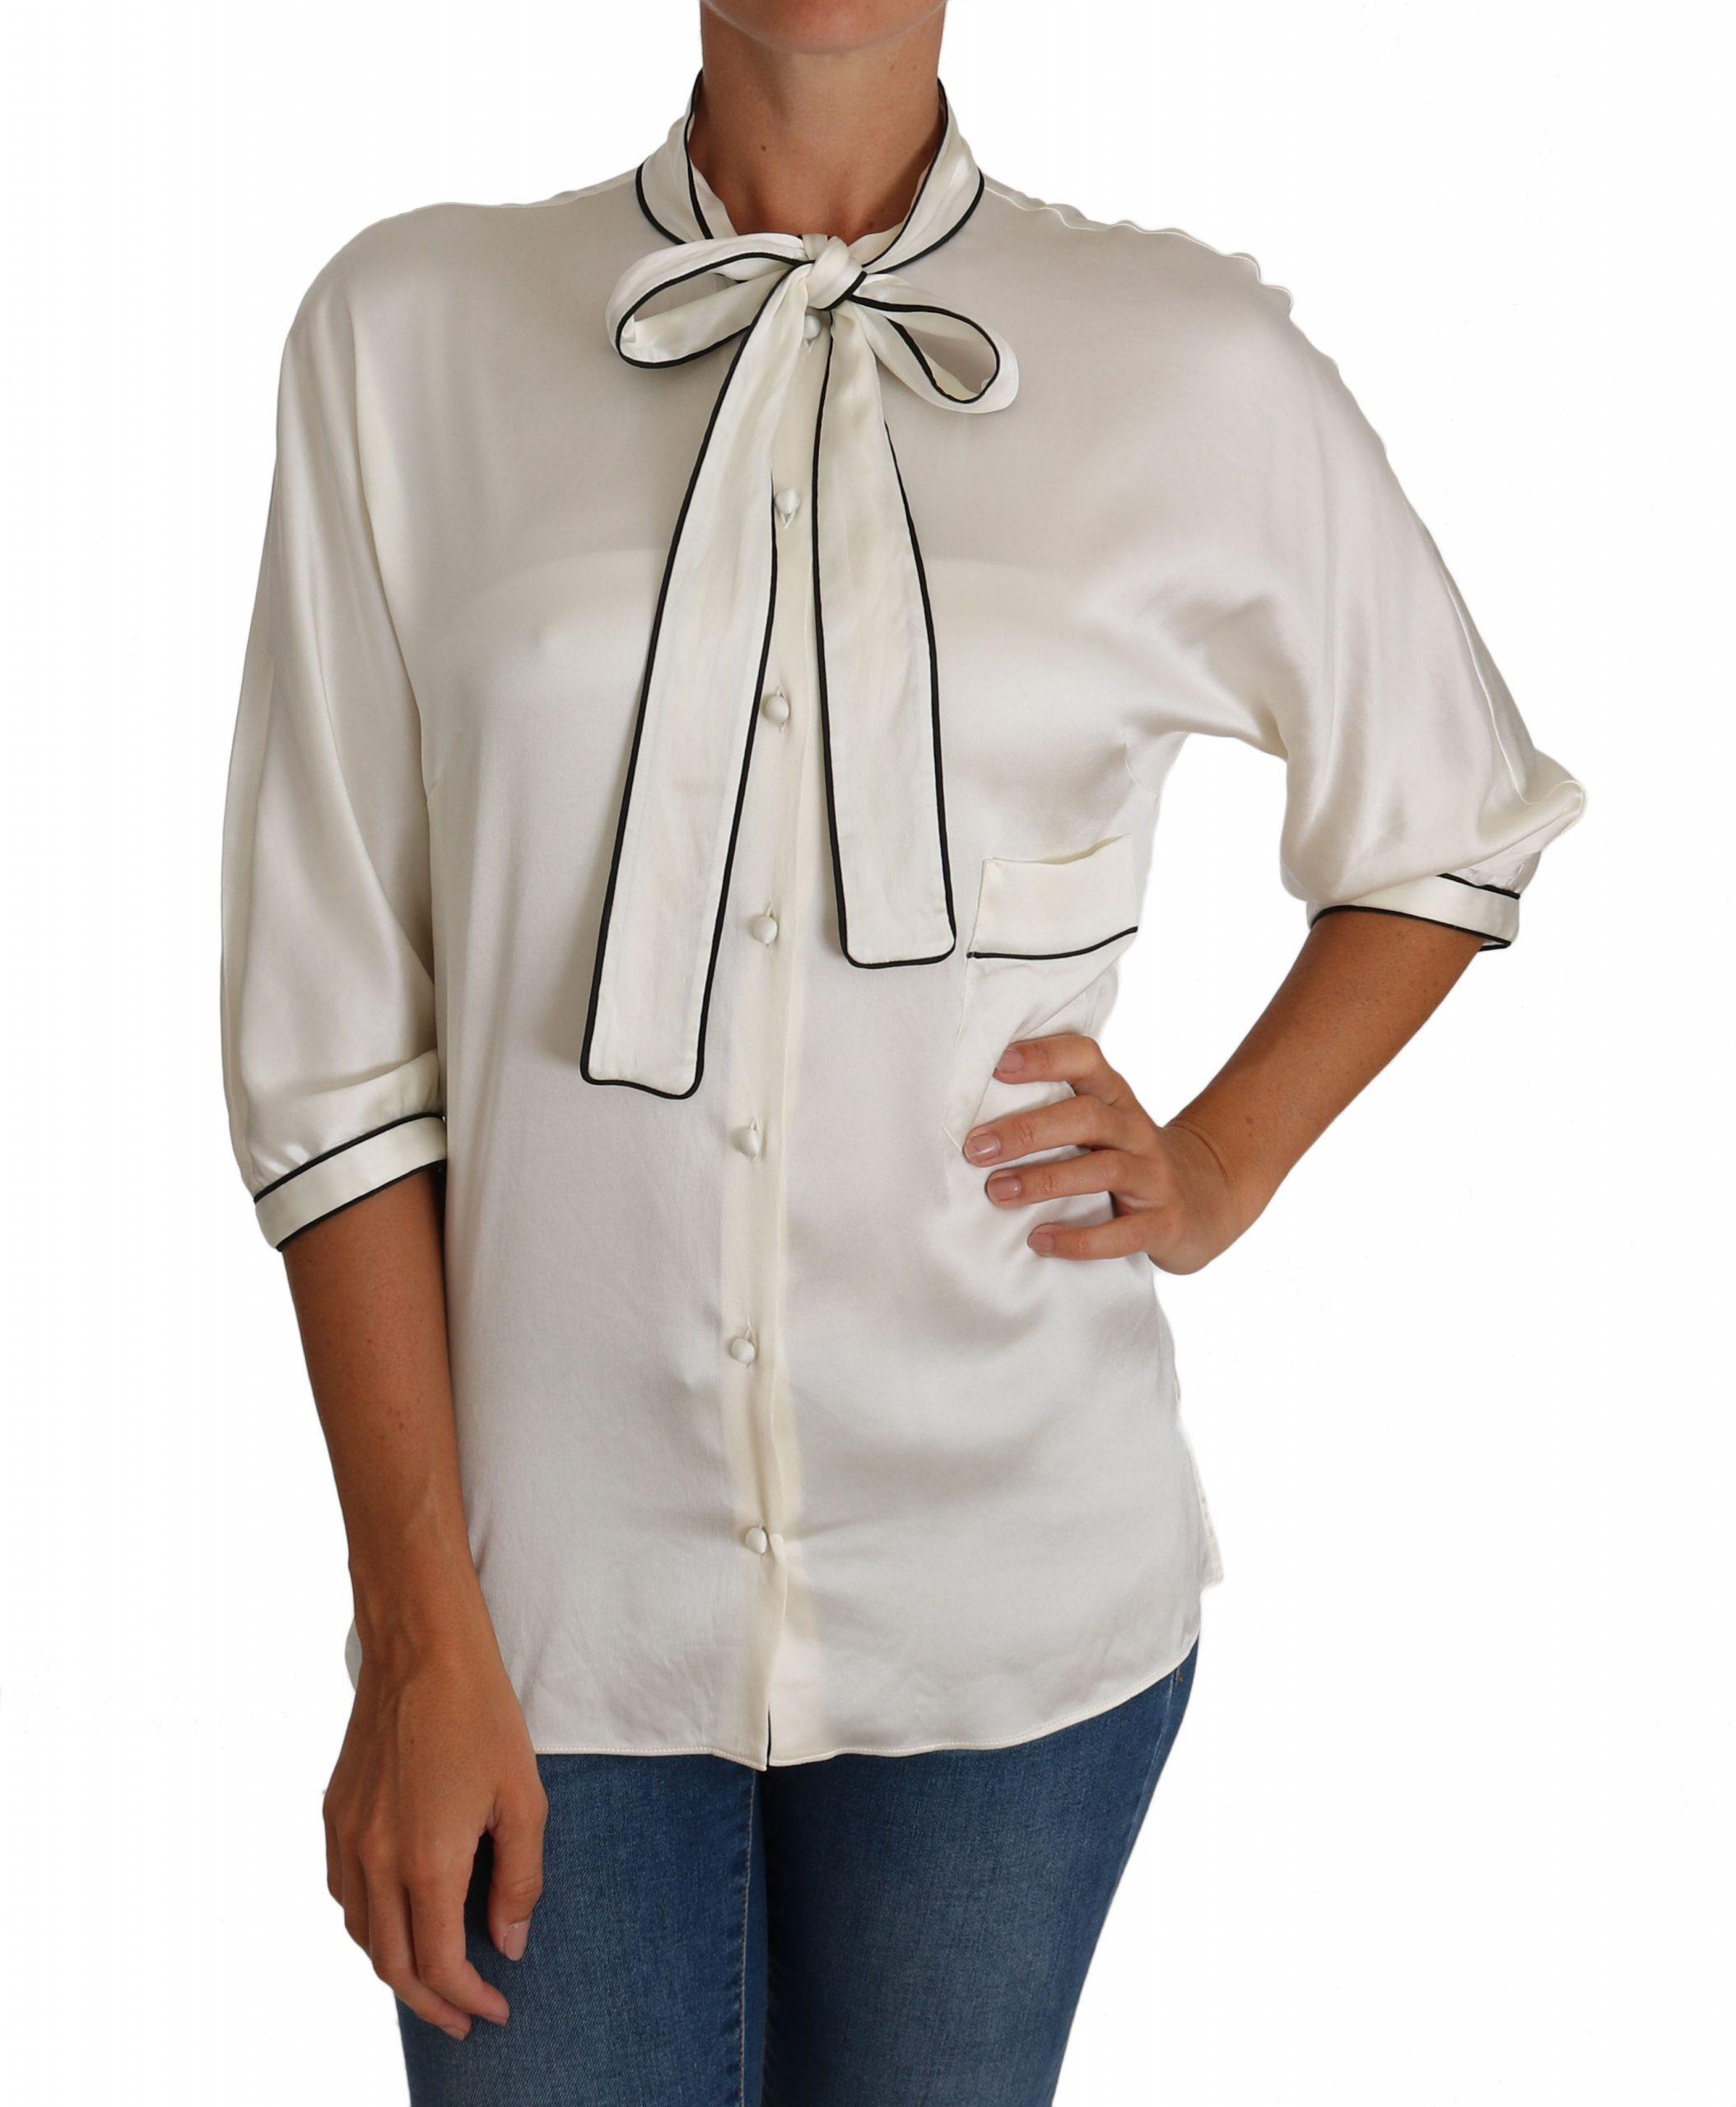 Dolce & Gabbana Women's Silk Pussy Bow Shirts White TSH2494 - IT42|M